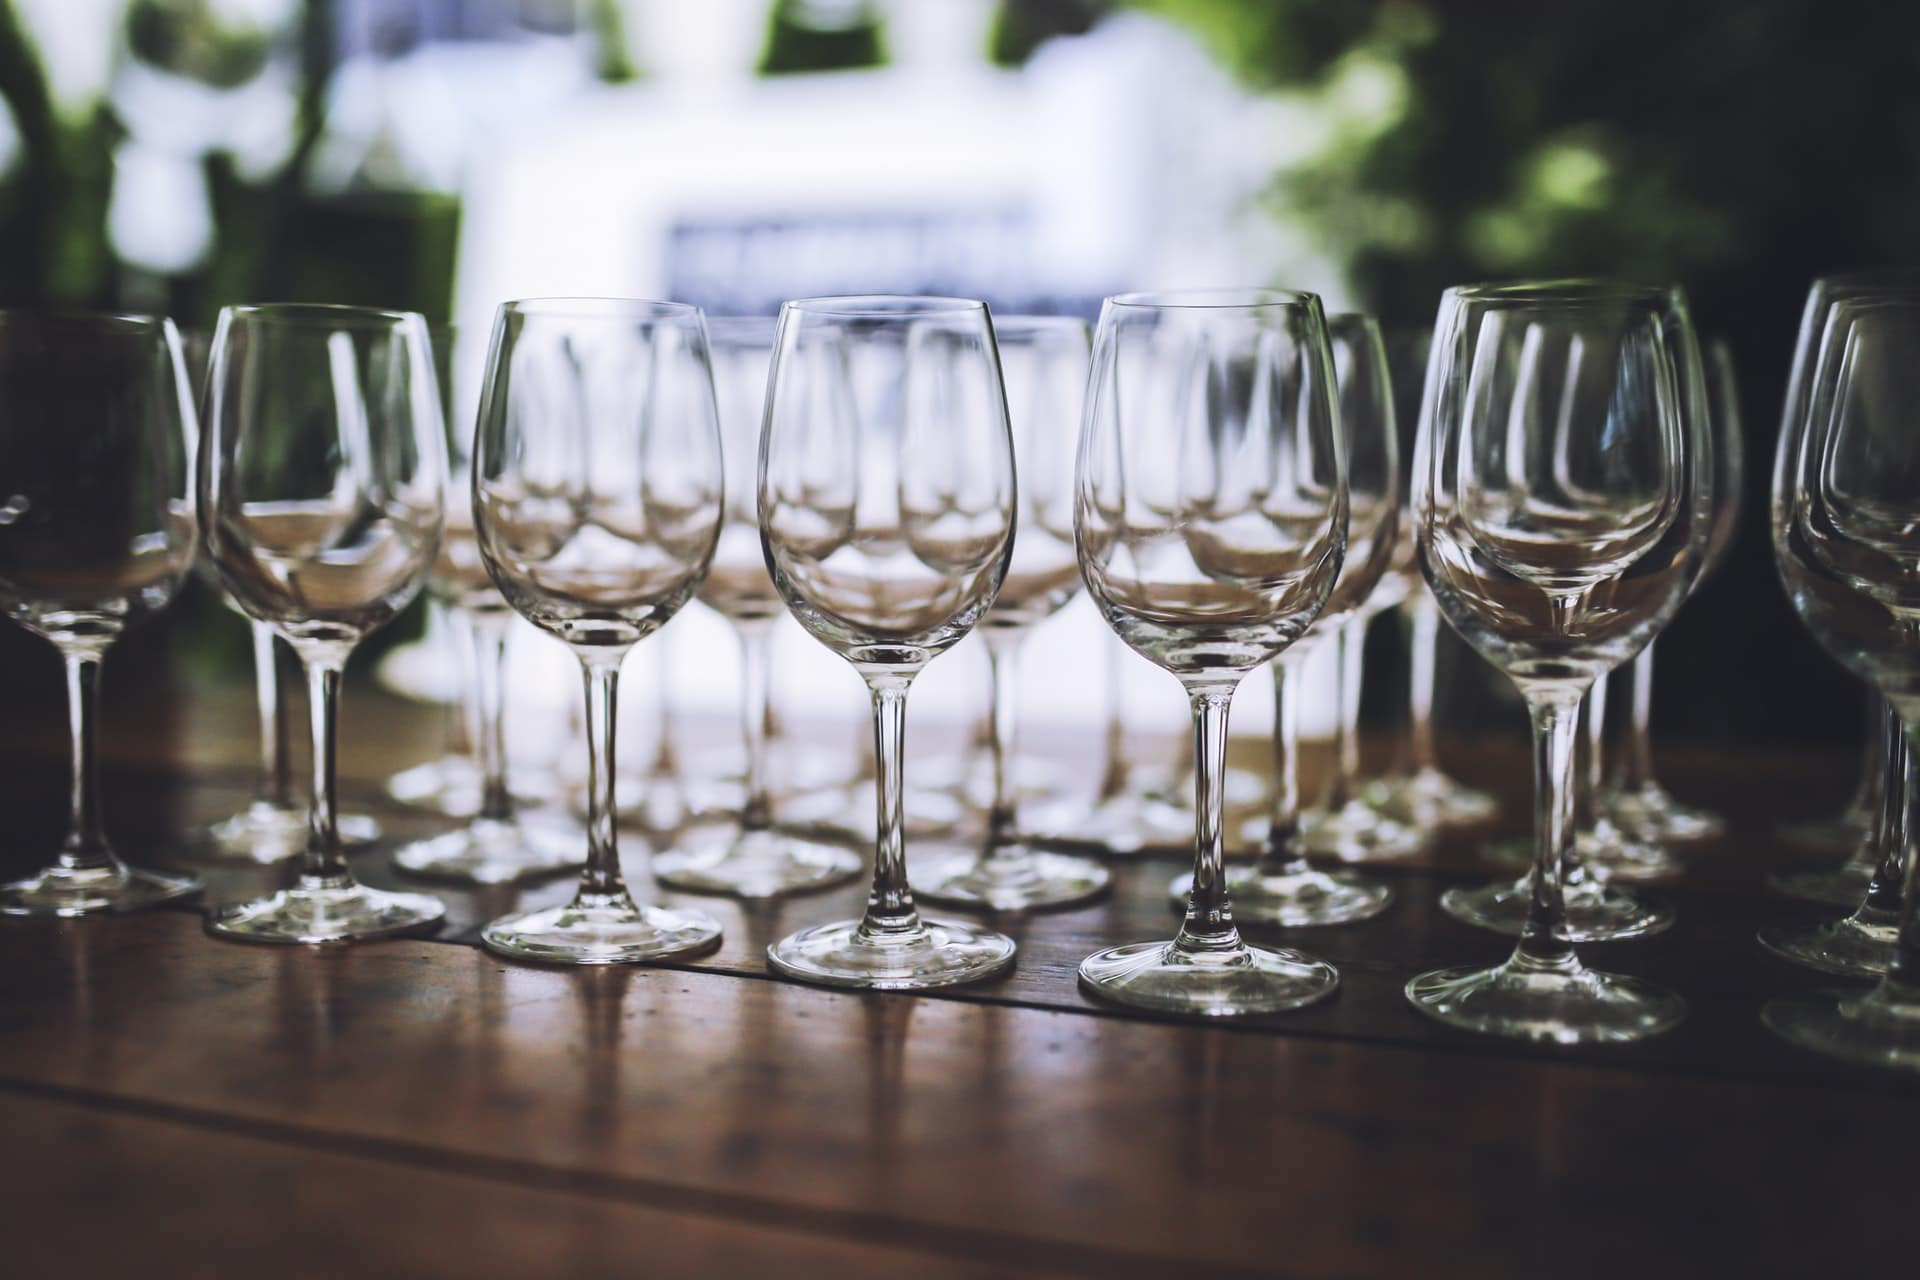 bicchieri vino vuoti